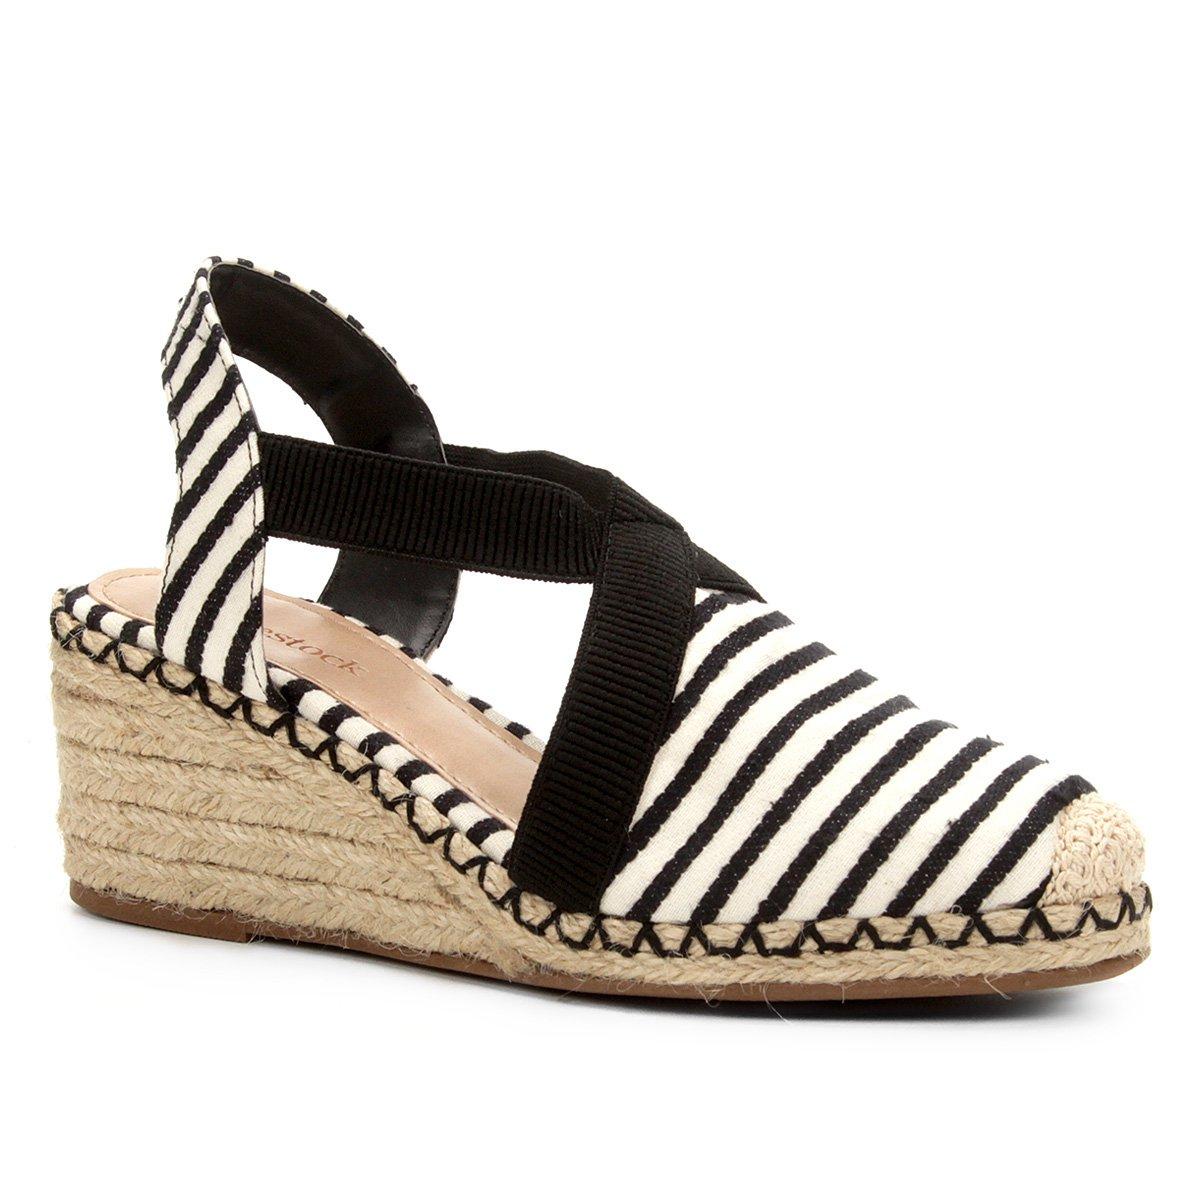 9c3fd4486a Sandália Anabela Shoestock Elástico Corda Feminina - Preto - Compre Agora